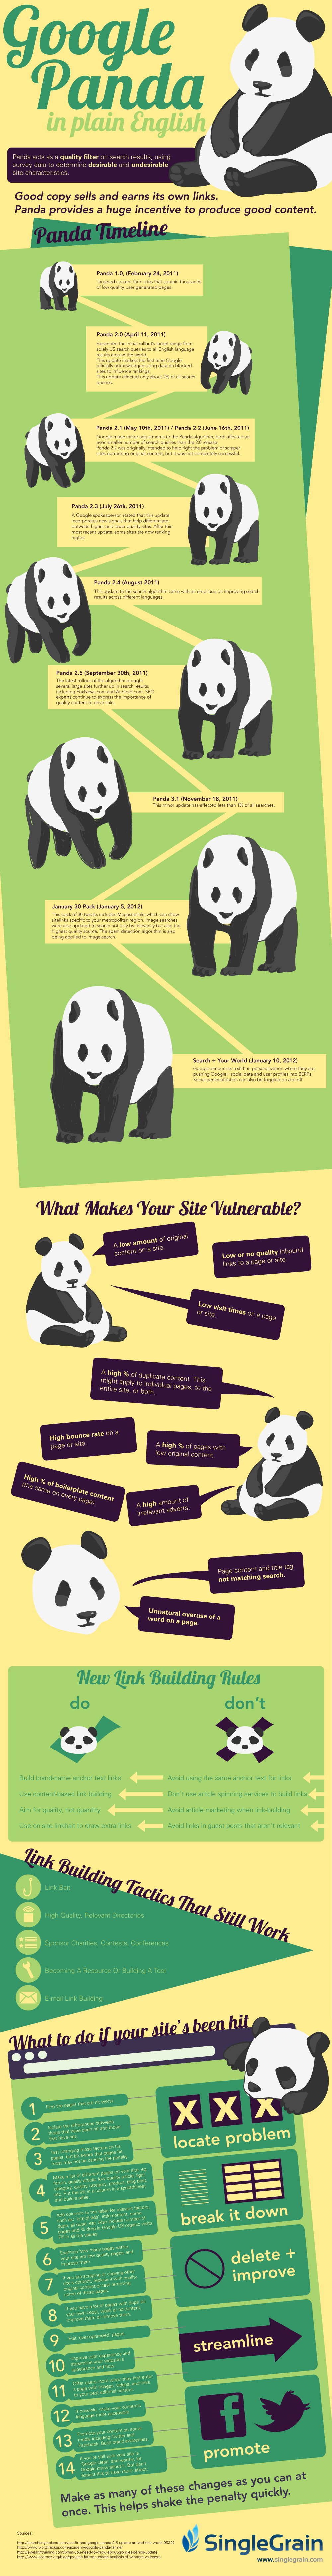 Panda Google Infographie